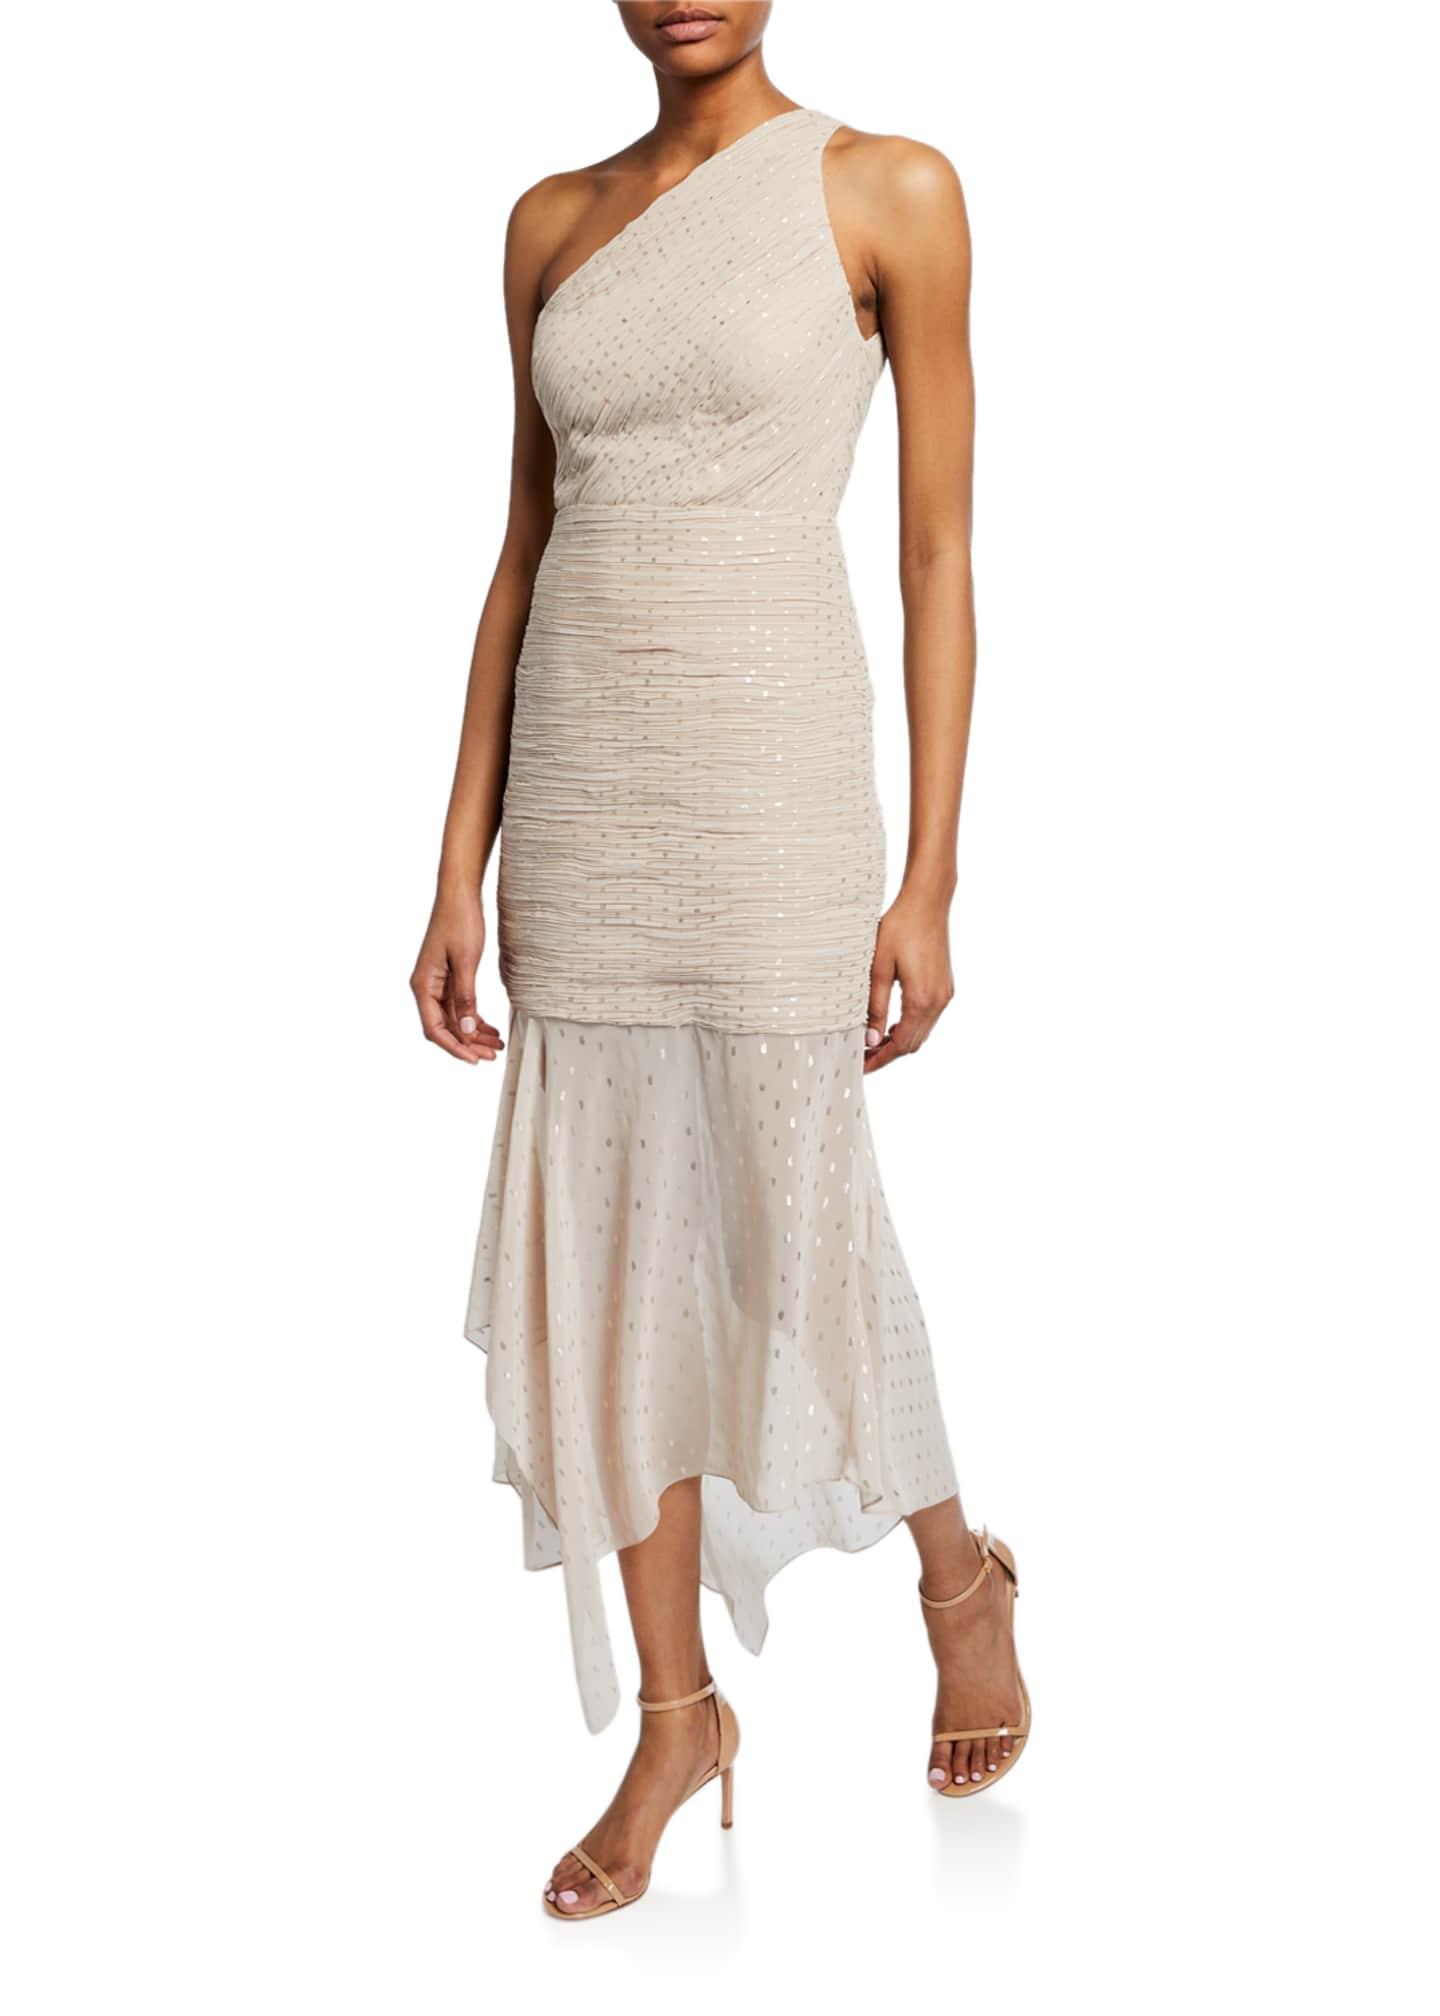 Halston One-Shoulder Pleated Metallic Dot Chiffon Dress